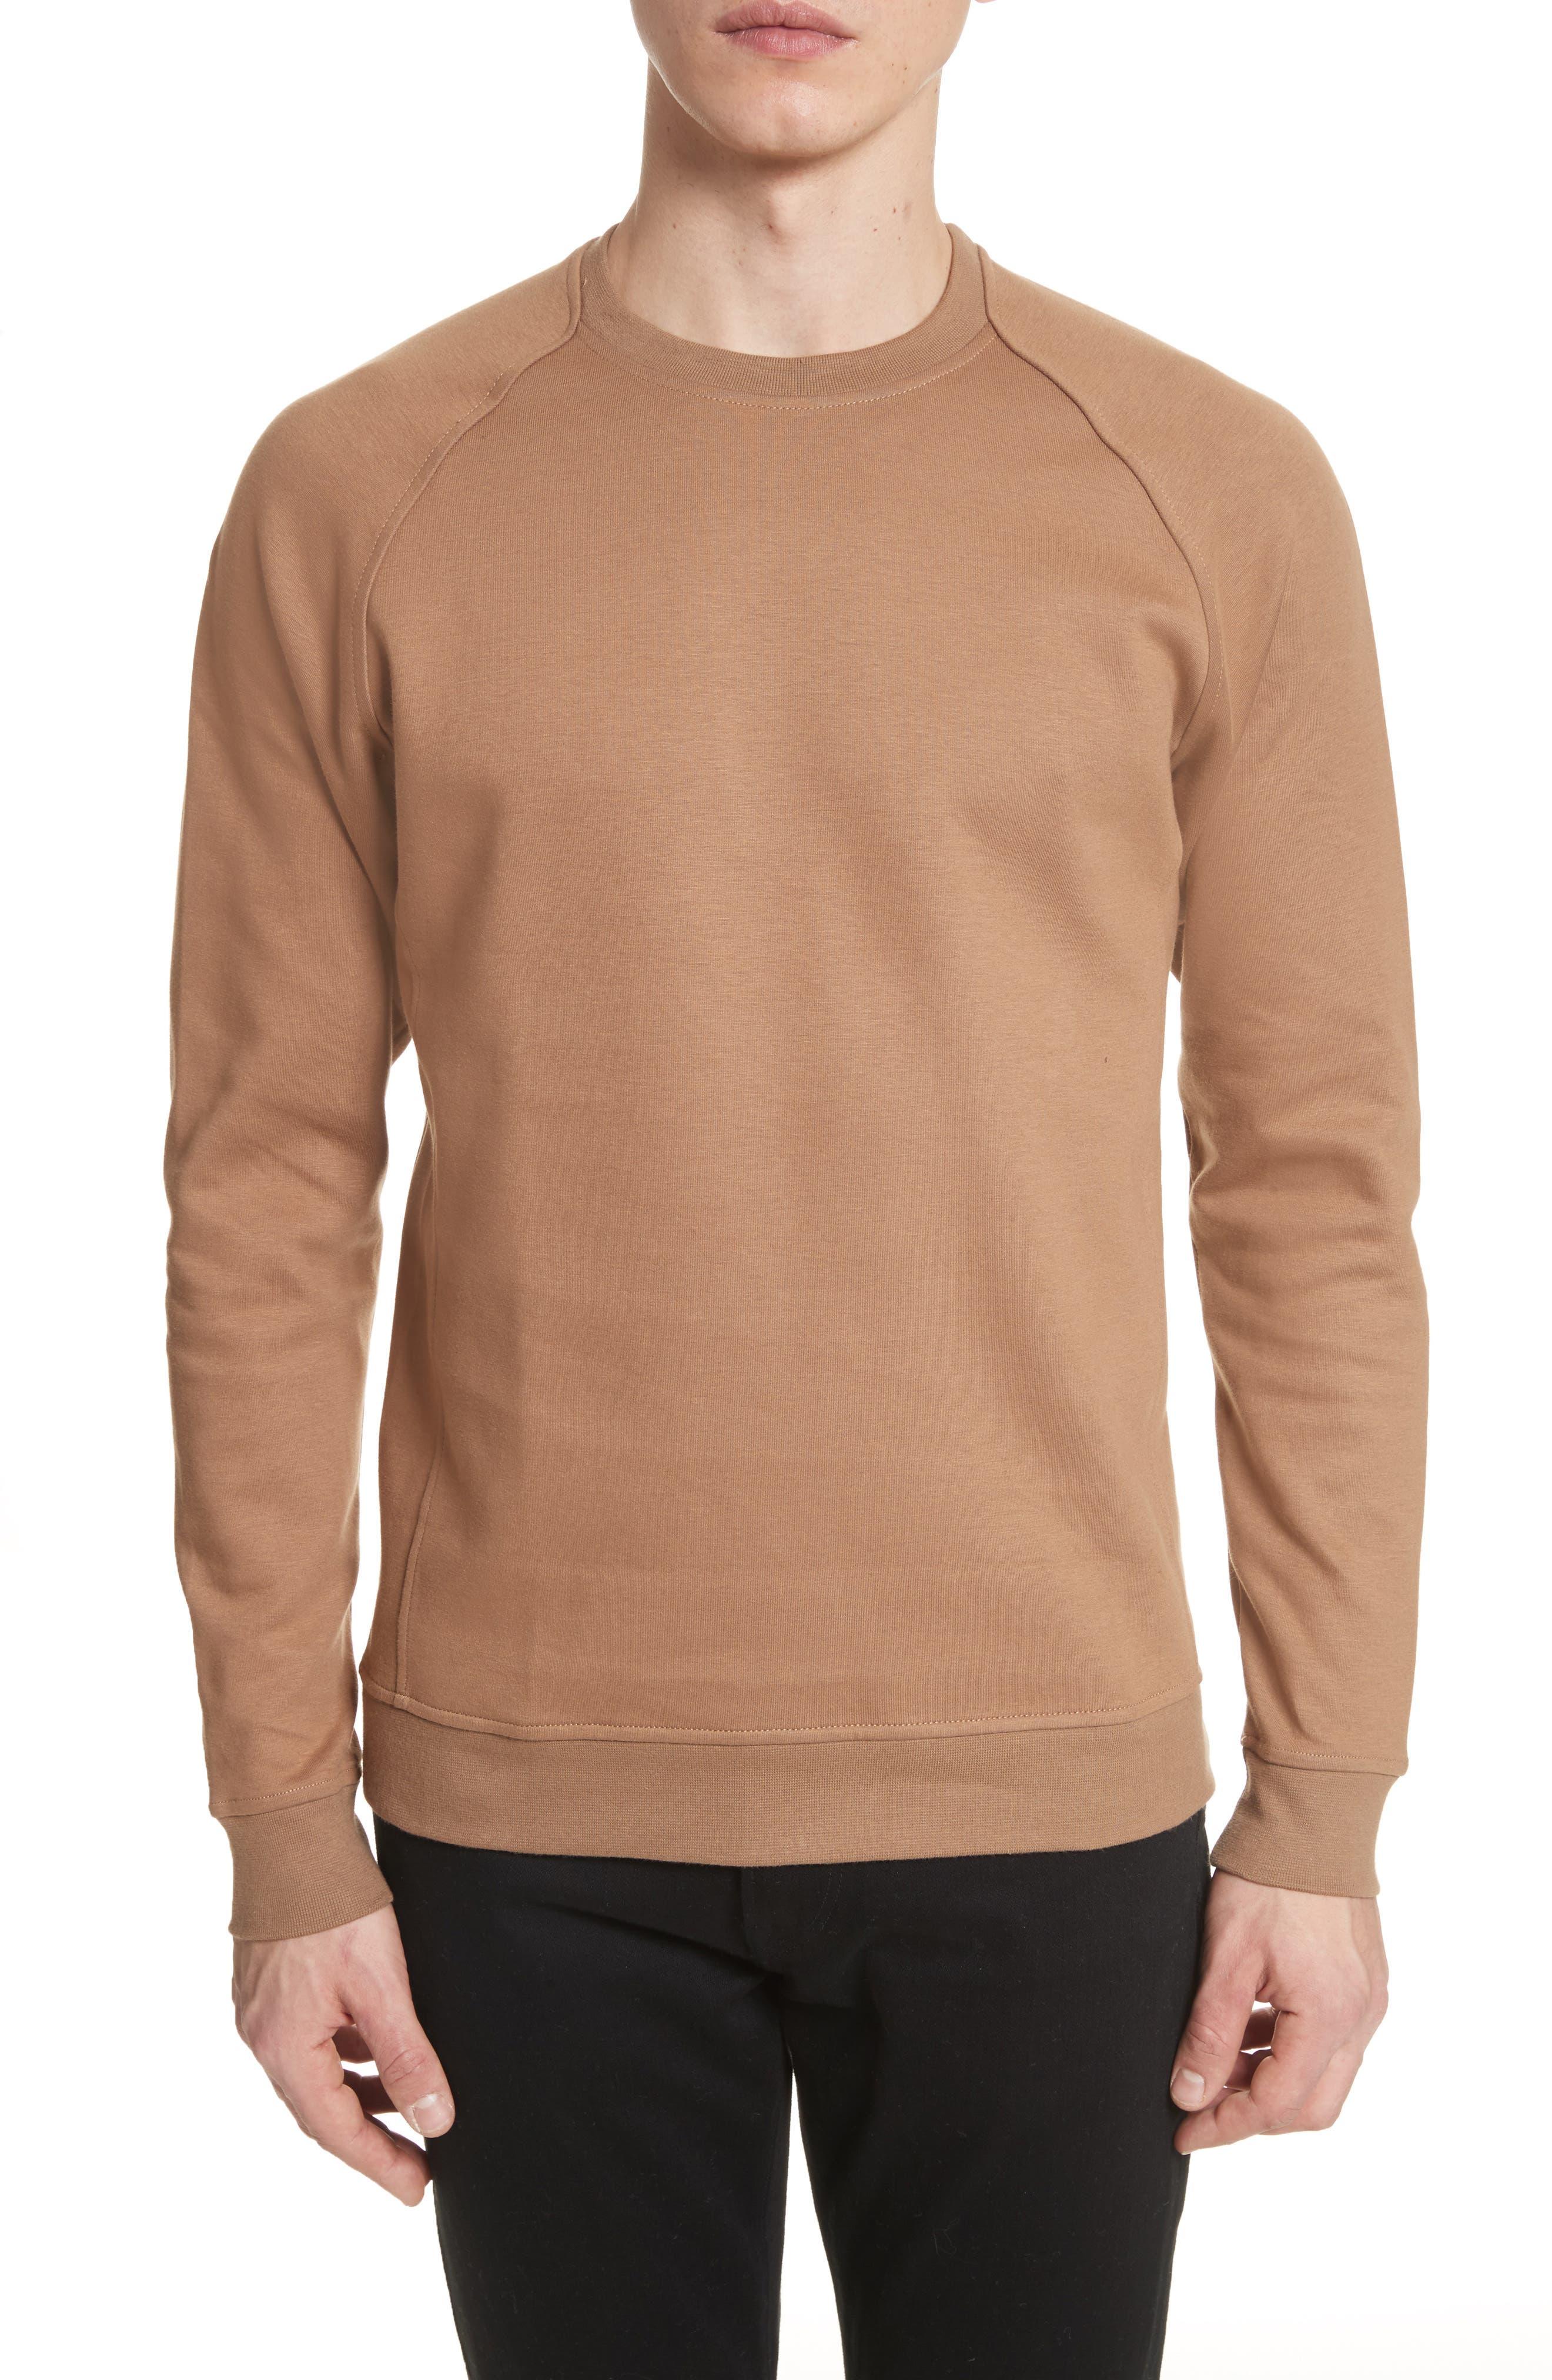 Ketel Dry Mercerized Crewneck Sweatshirt,                             Main thumbnail 1, color,                             Light Sand